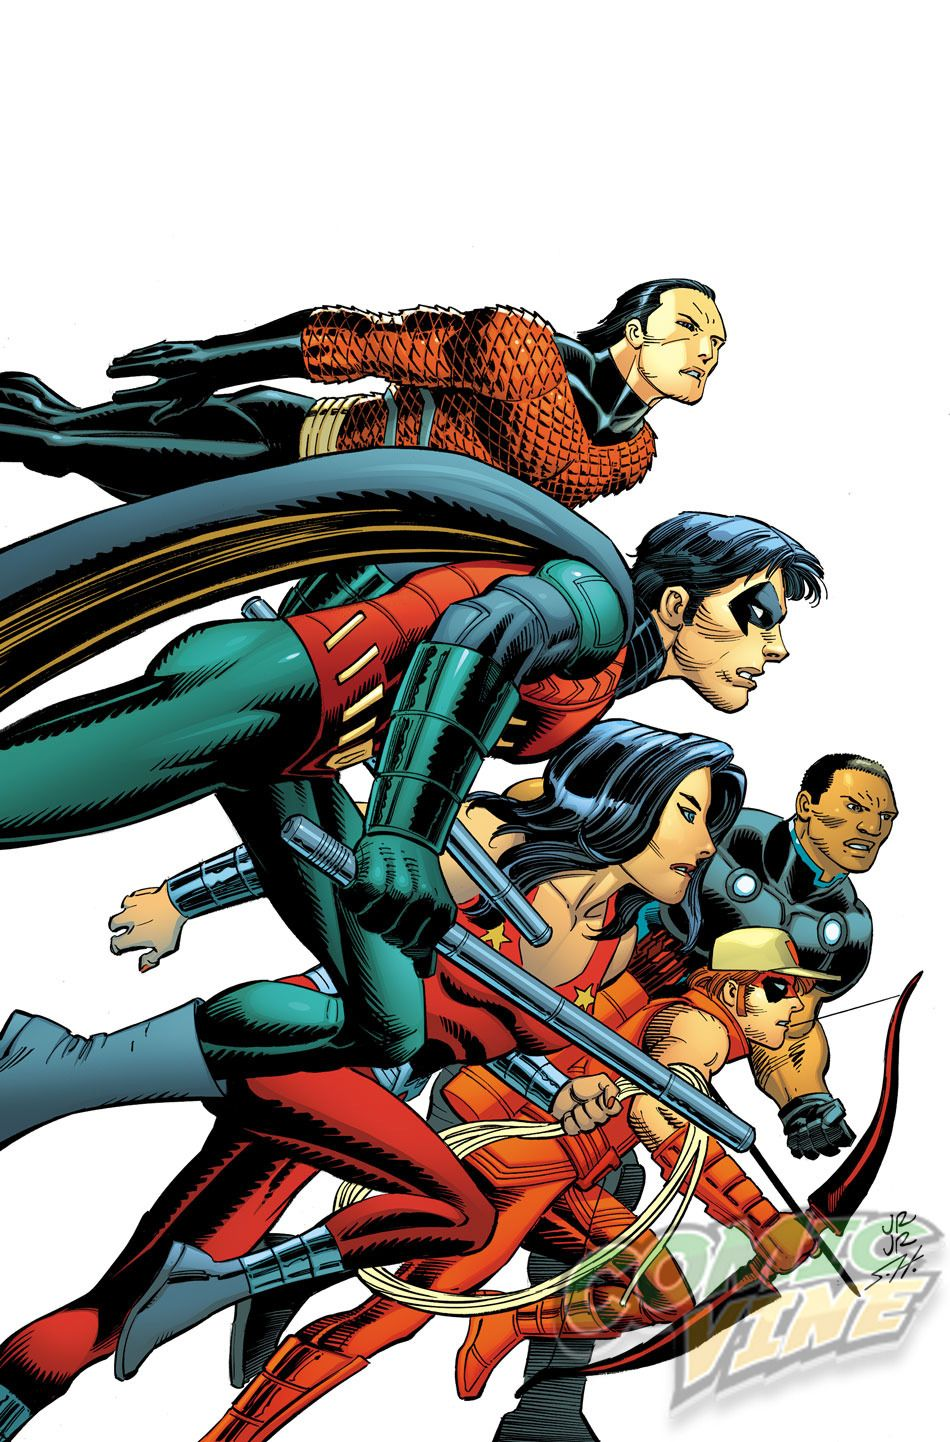 DC Comics April 2016 Theme Month Variant Covers Revealed - John Romita Jr - Comic  Vine - Visit to grab an amazing super hero shirt now on sale!